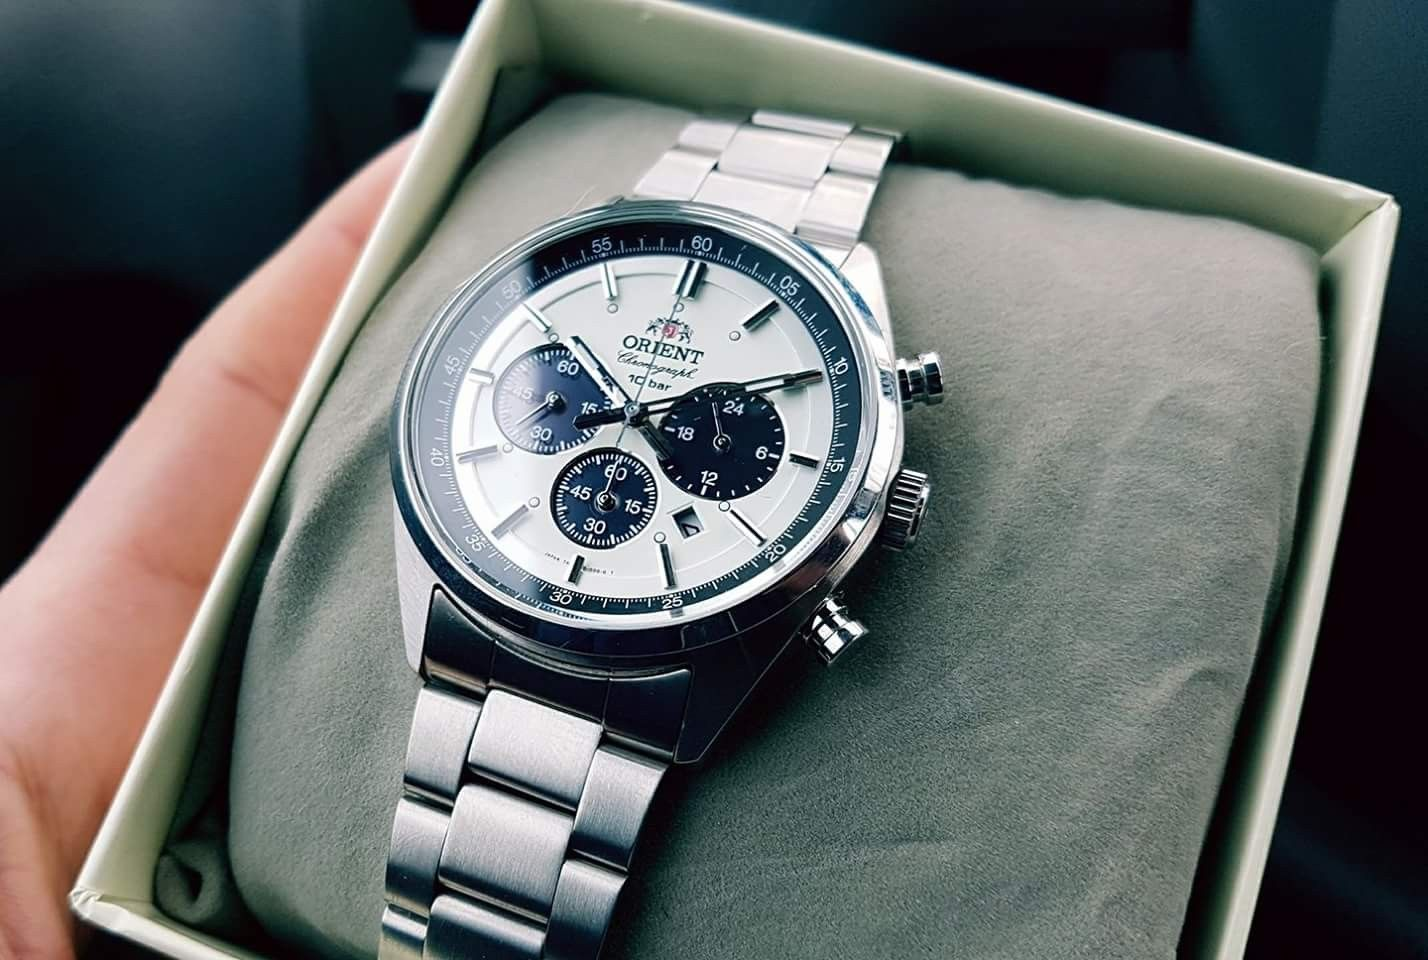 237  ORIENT Men s watch NEO 70 s neo-Seventies SOLAR PANDA milky white  WV0041TX  orient  watch  chrono  affordable 9c1908951ba